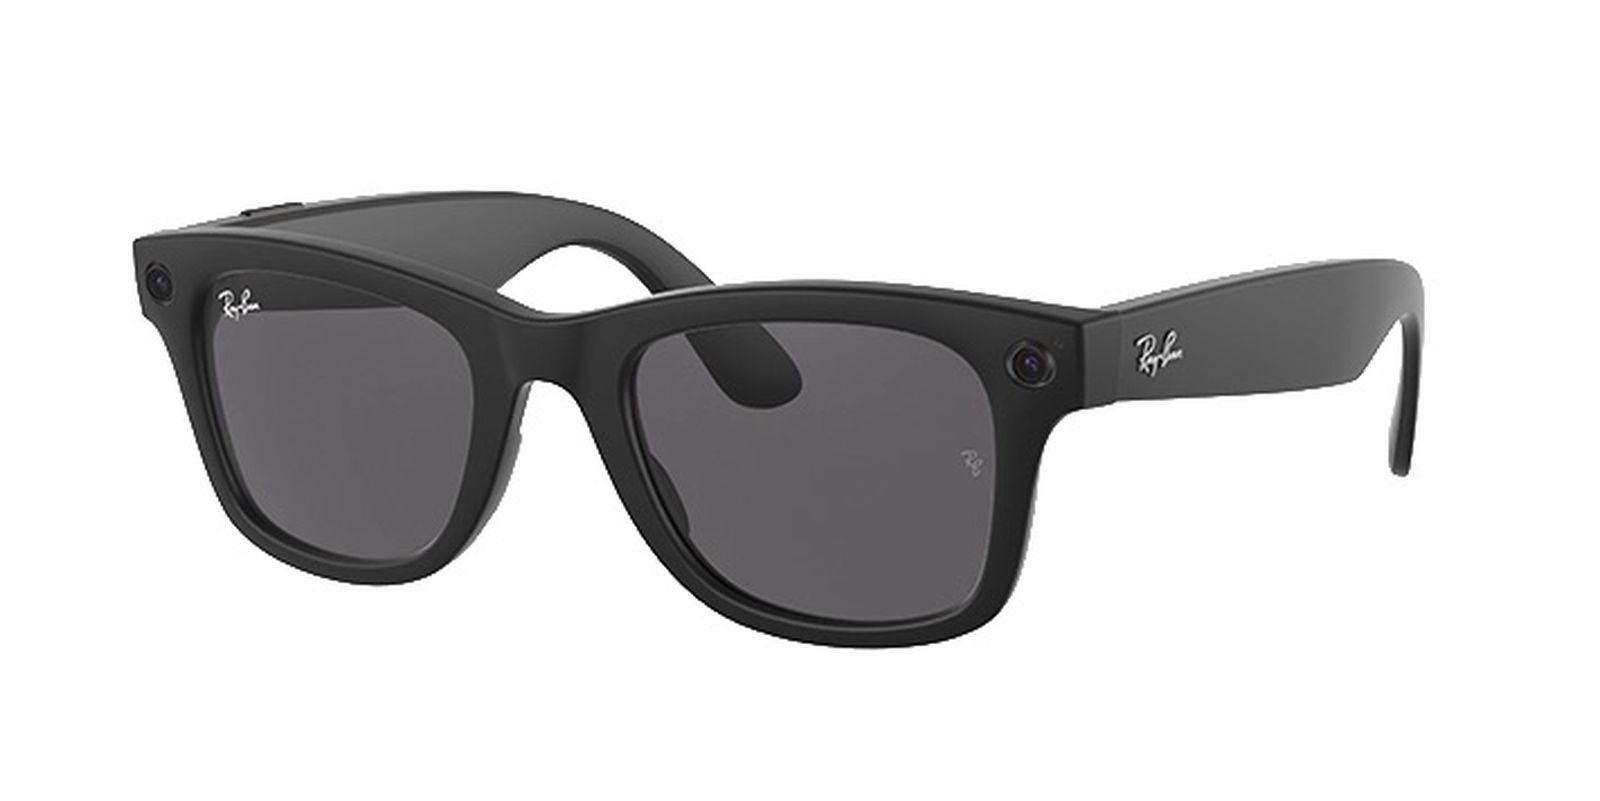 Facebook Debuts $299 'Ray-Ban Stories' Smart Glasses